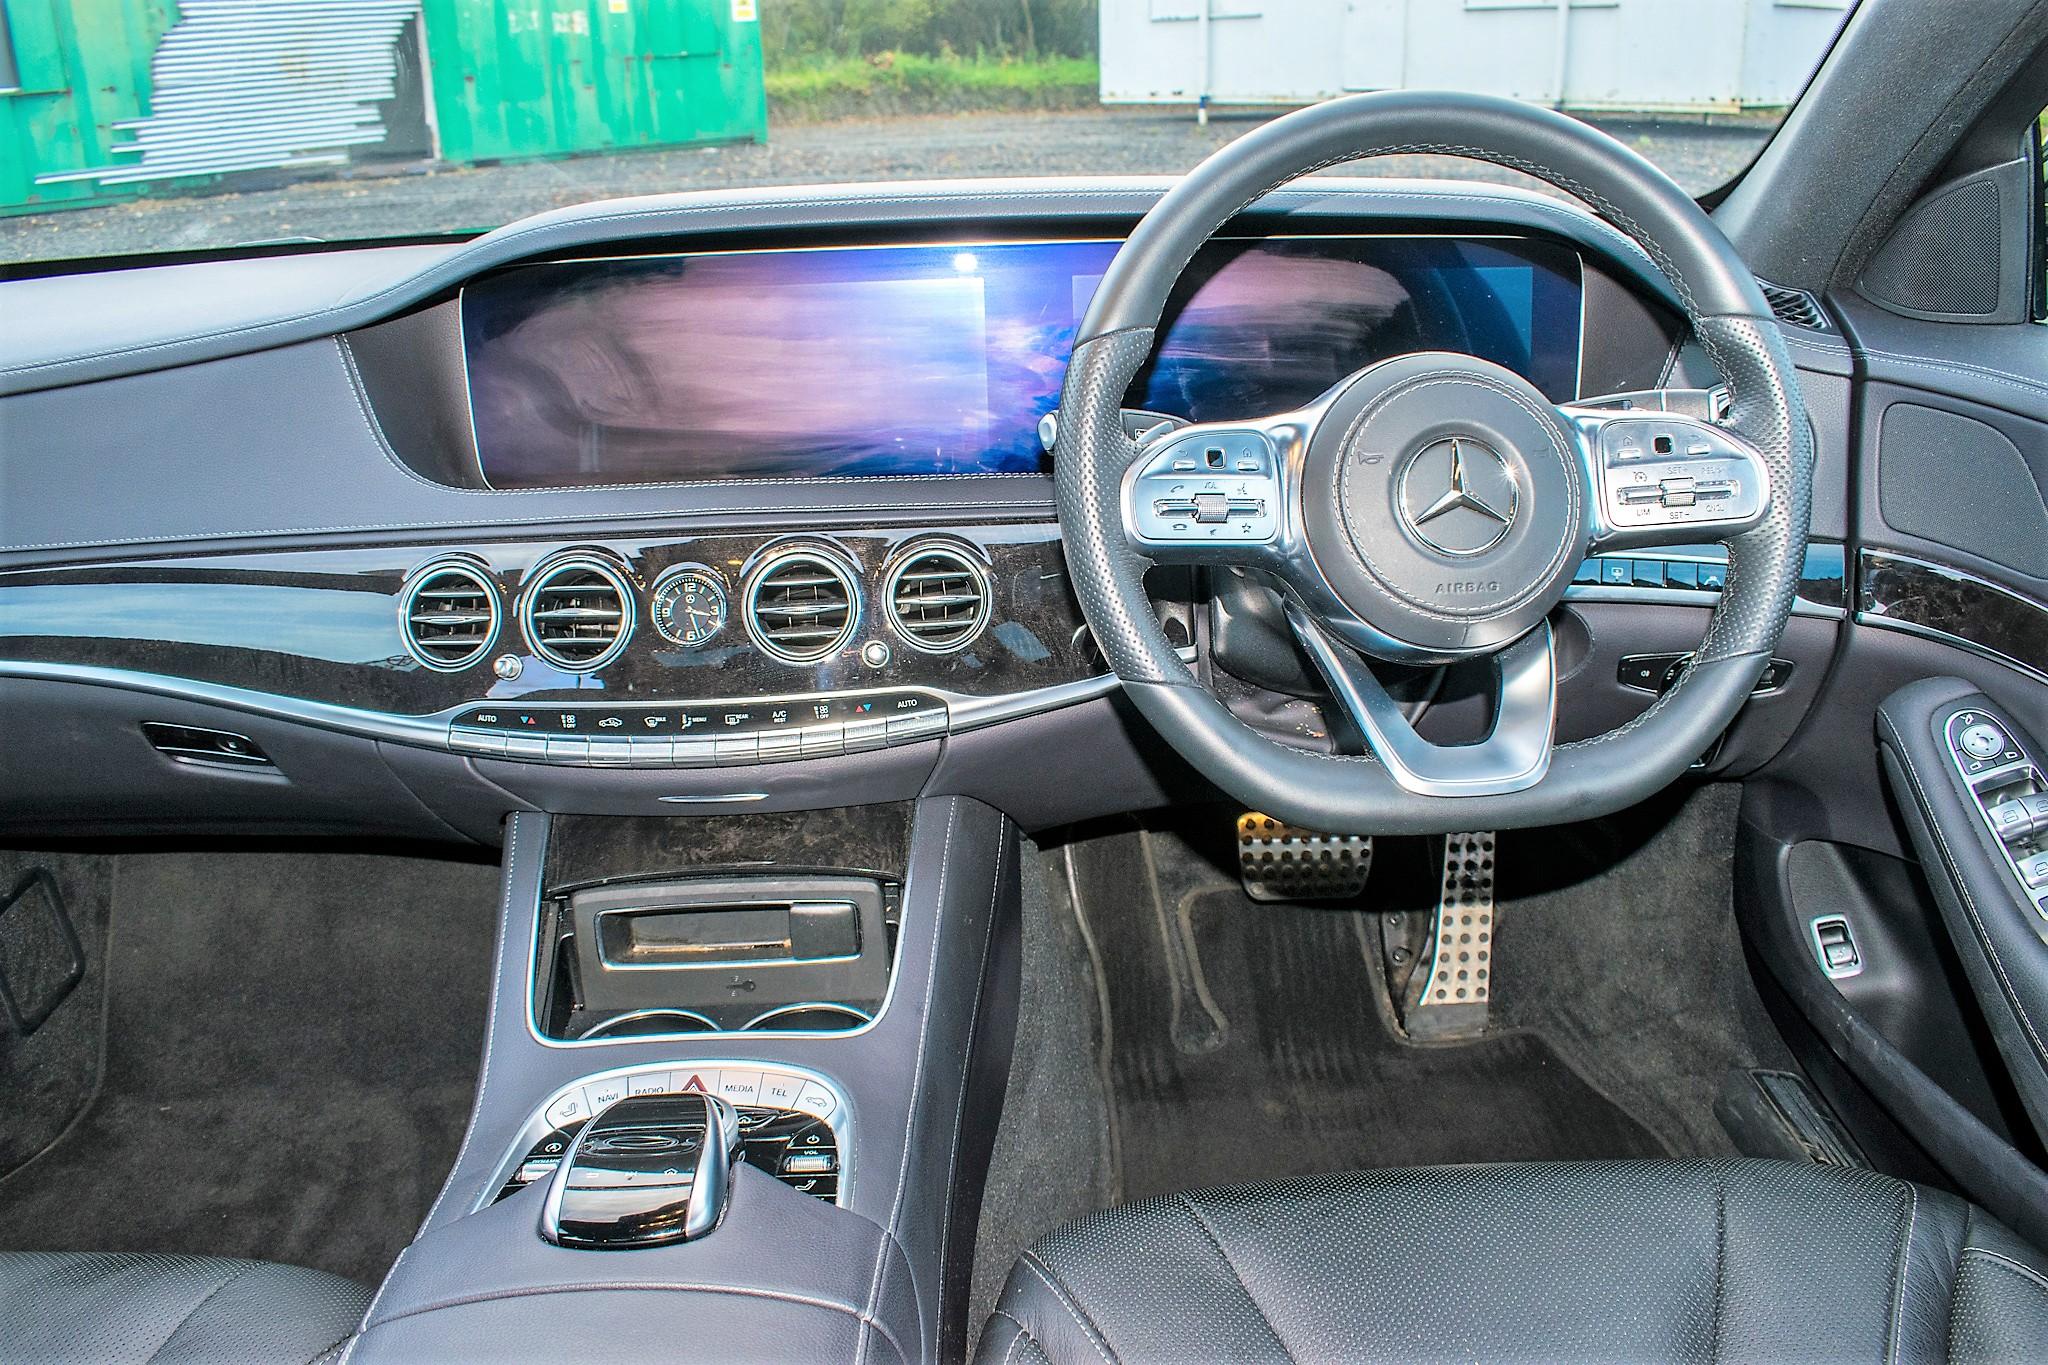 Mercedes Benz S450 L AMG Line Executive auto petrol 4 door saloon car Registration Number: FX68 - Image 27 of 33